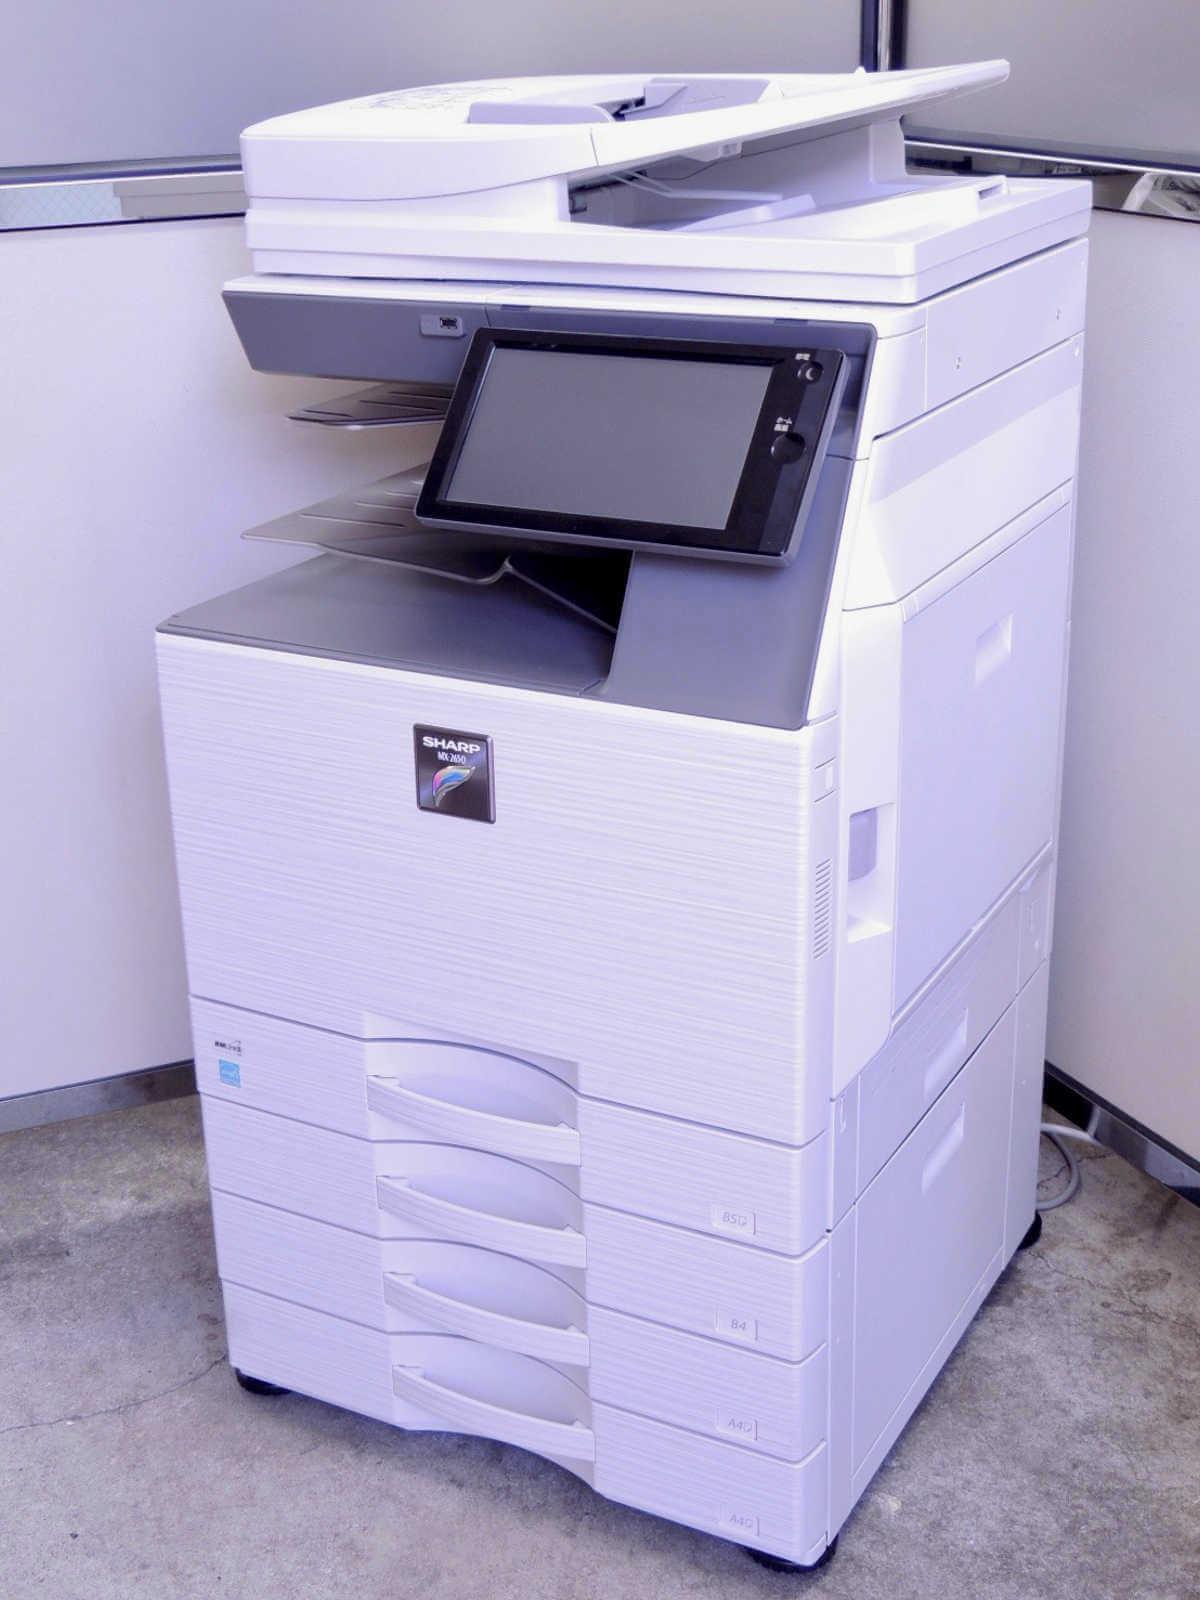 MX-3650FN(SHARP)中古カラー複合機・中高速・A3・Mac対応・AirPrint【コピヤス】